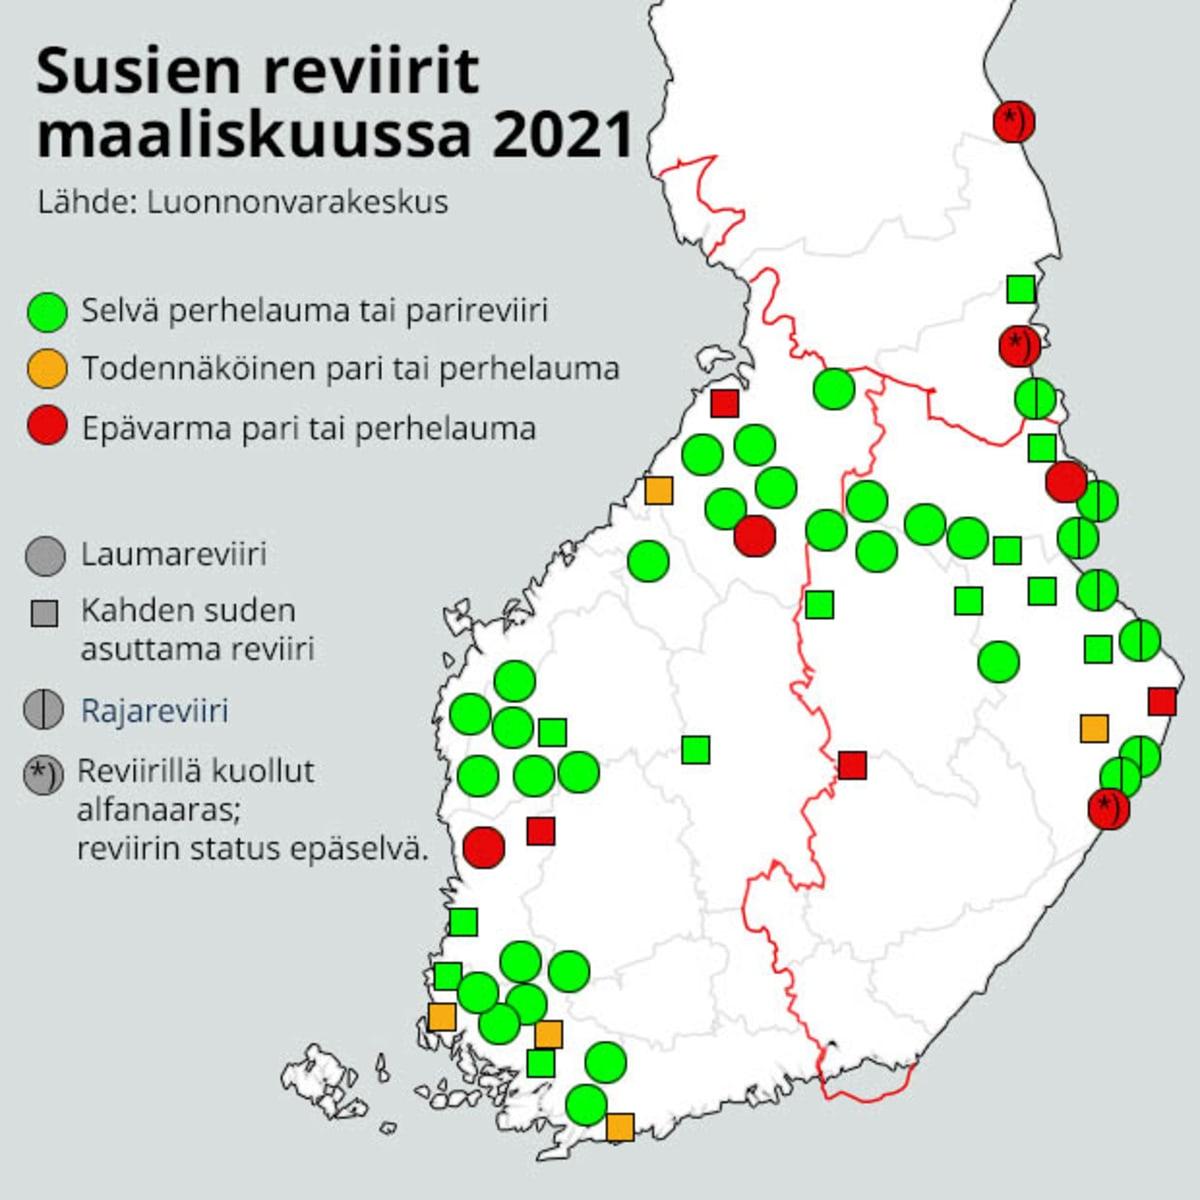 Susien reviirit Suomessa 2021.